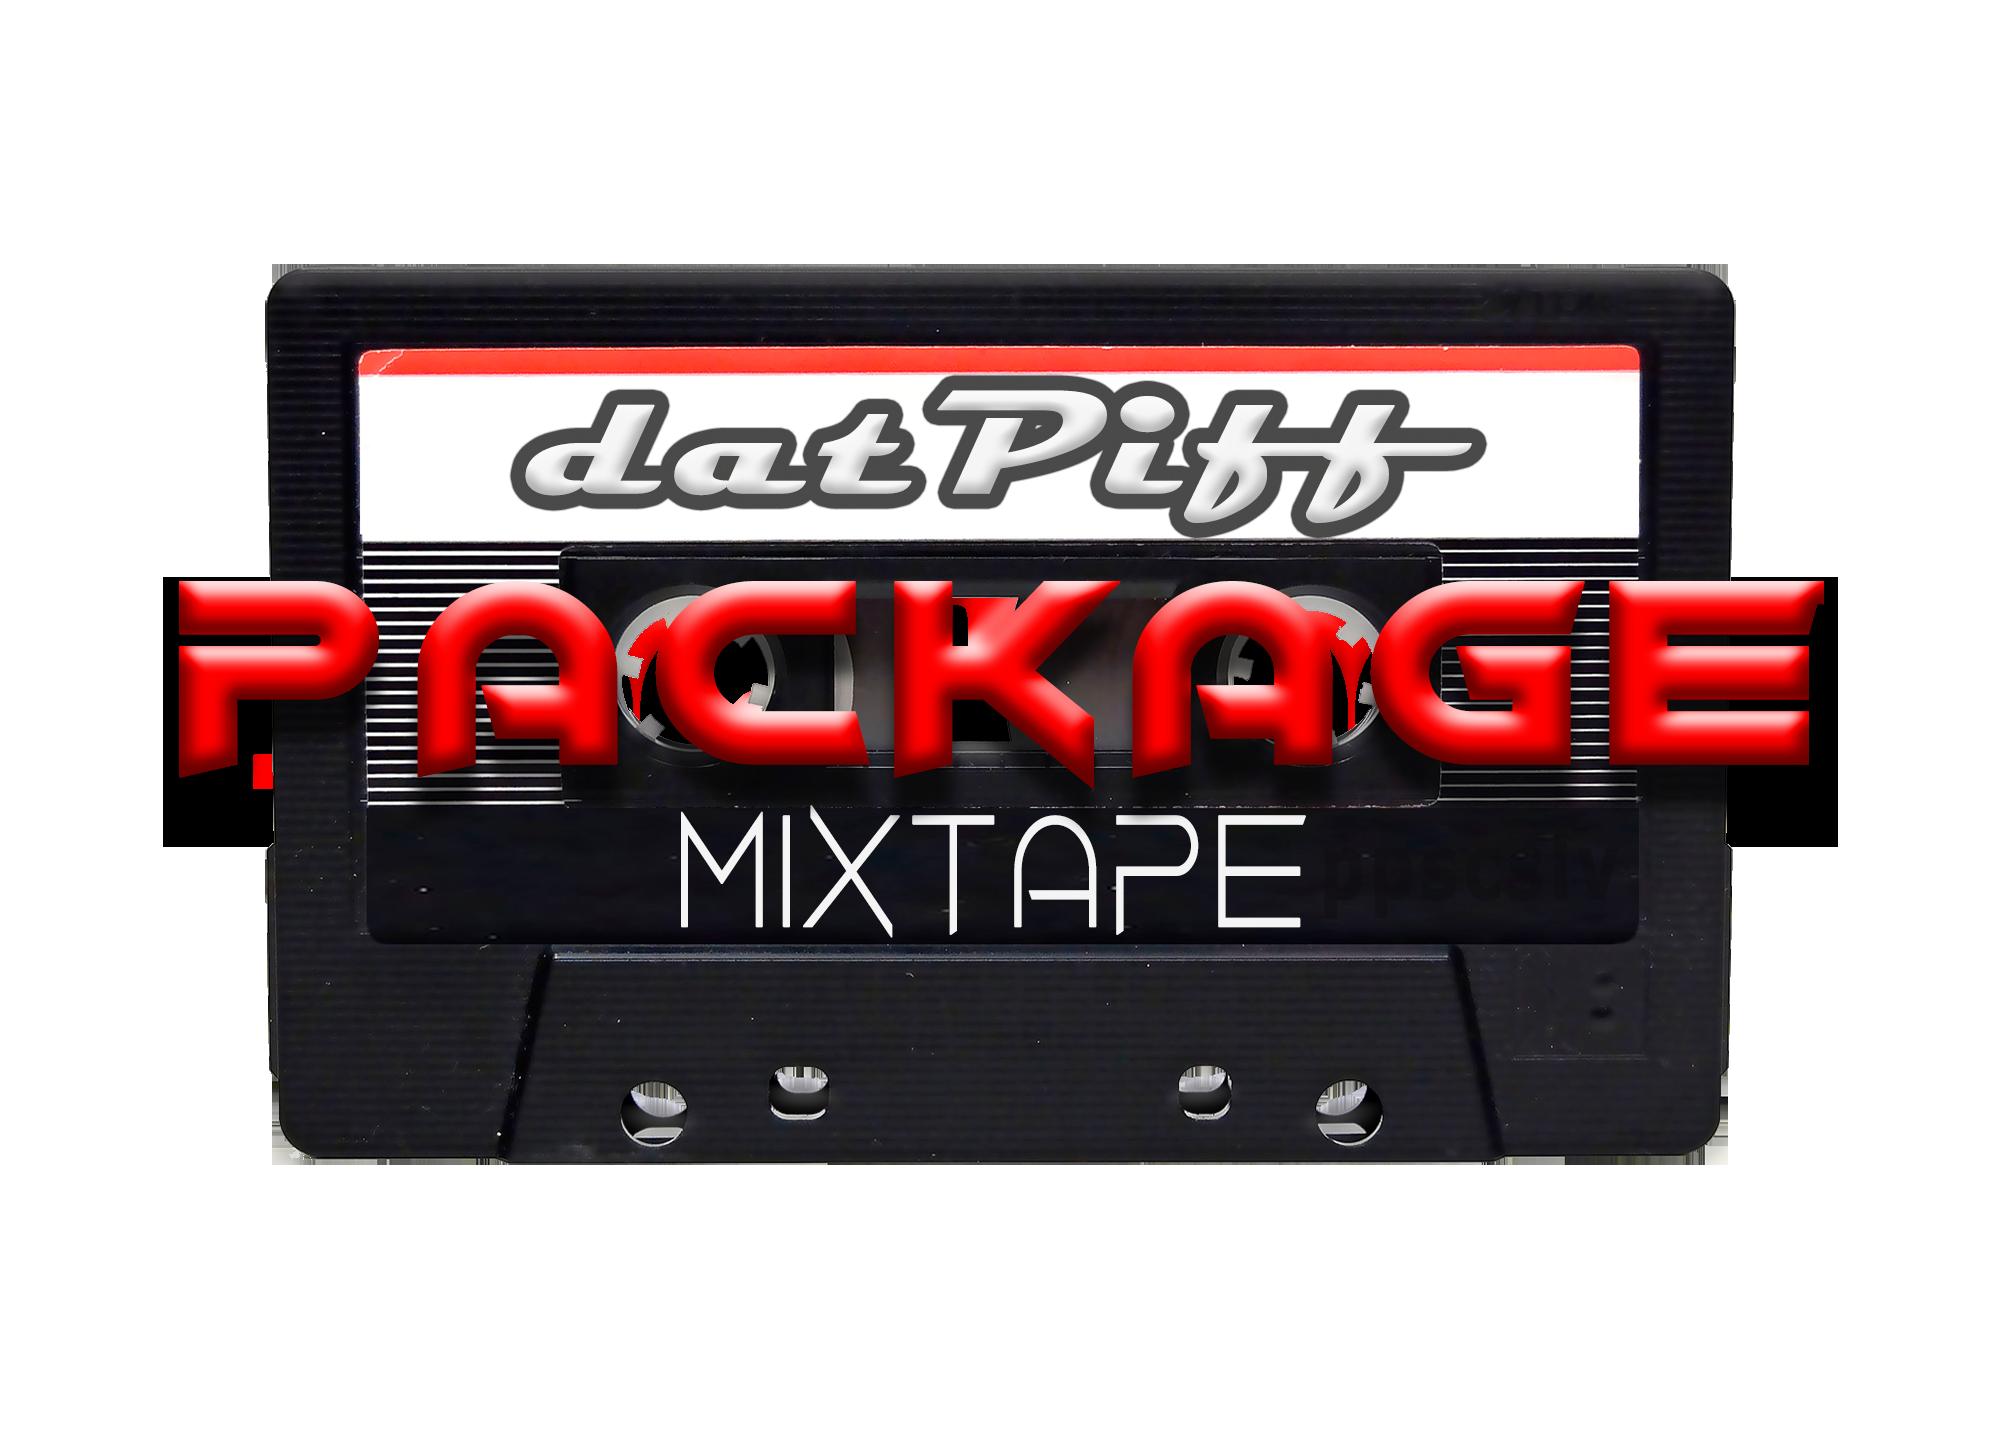 boost any DatPiff mixtape for $5 - SEOClerks